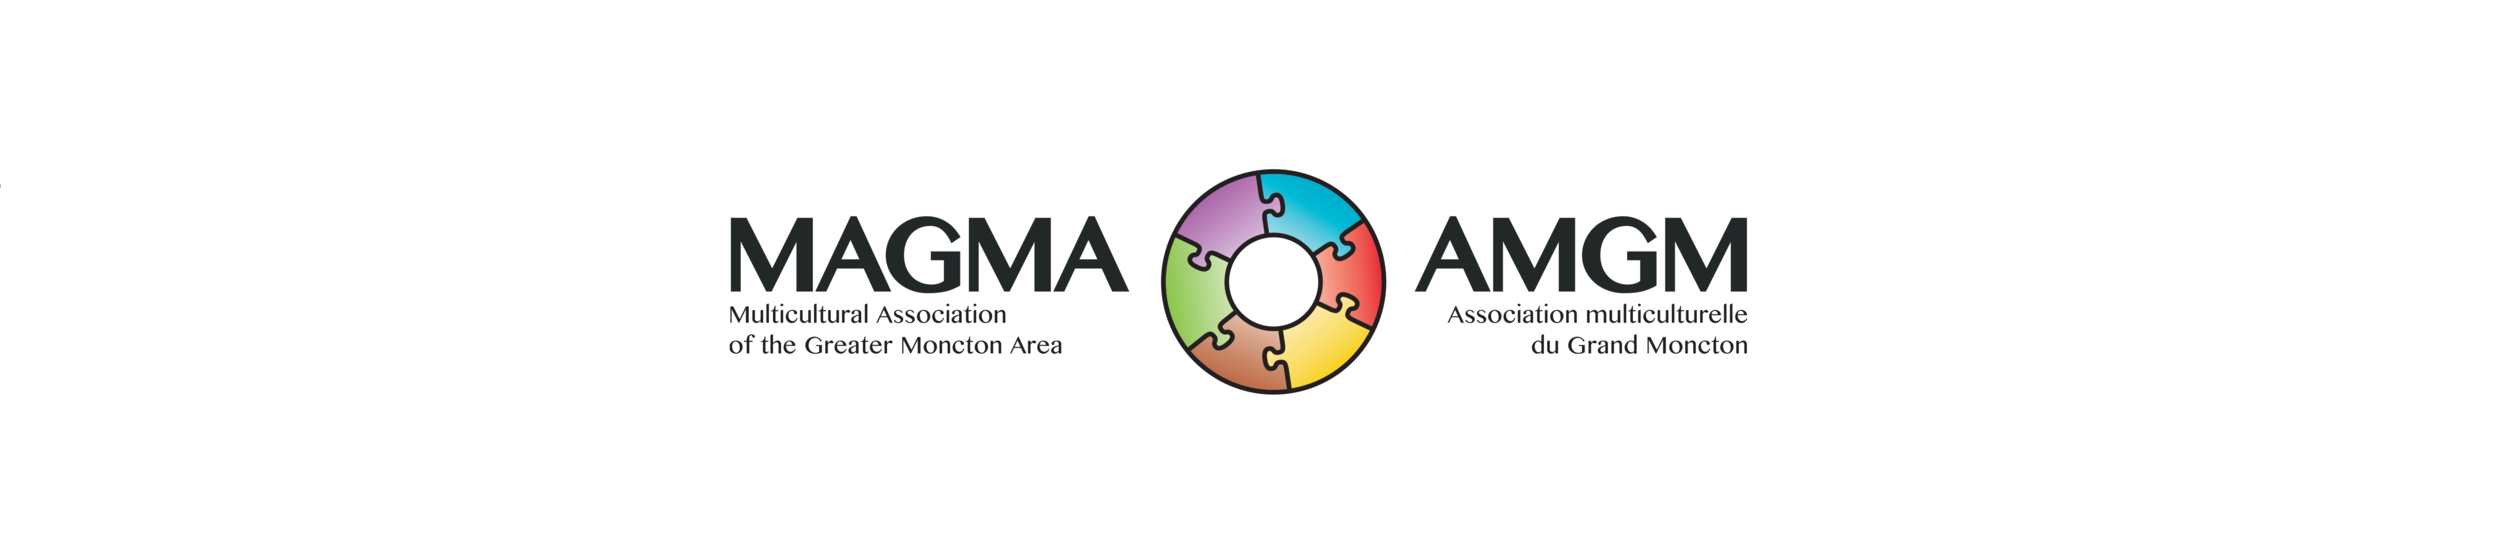 MAGMA Logo - Full Text (Transparent) Hi Res.png